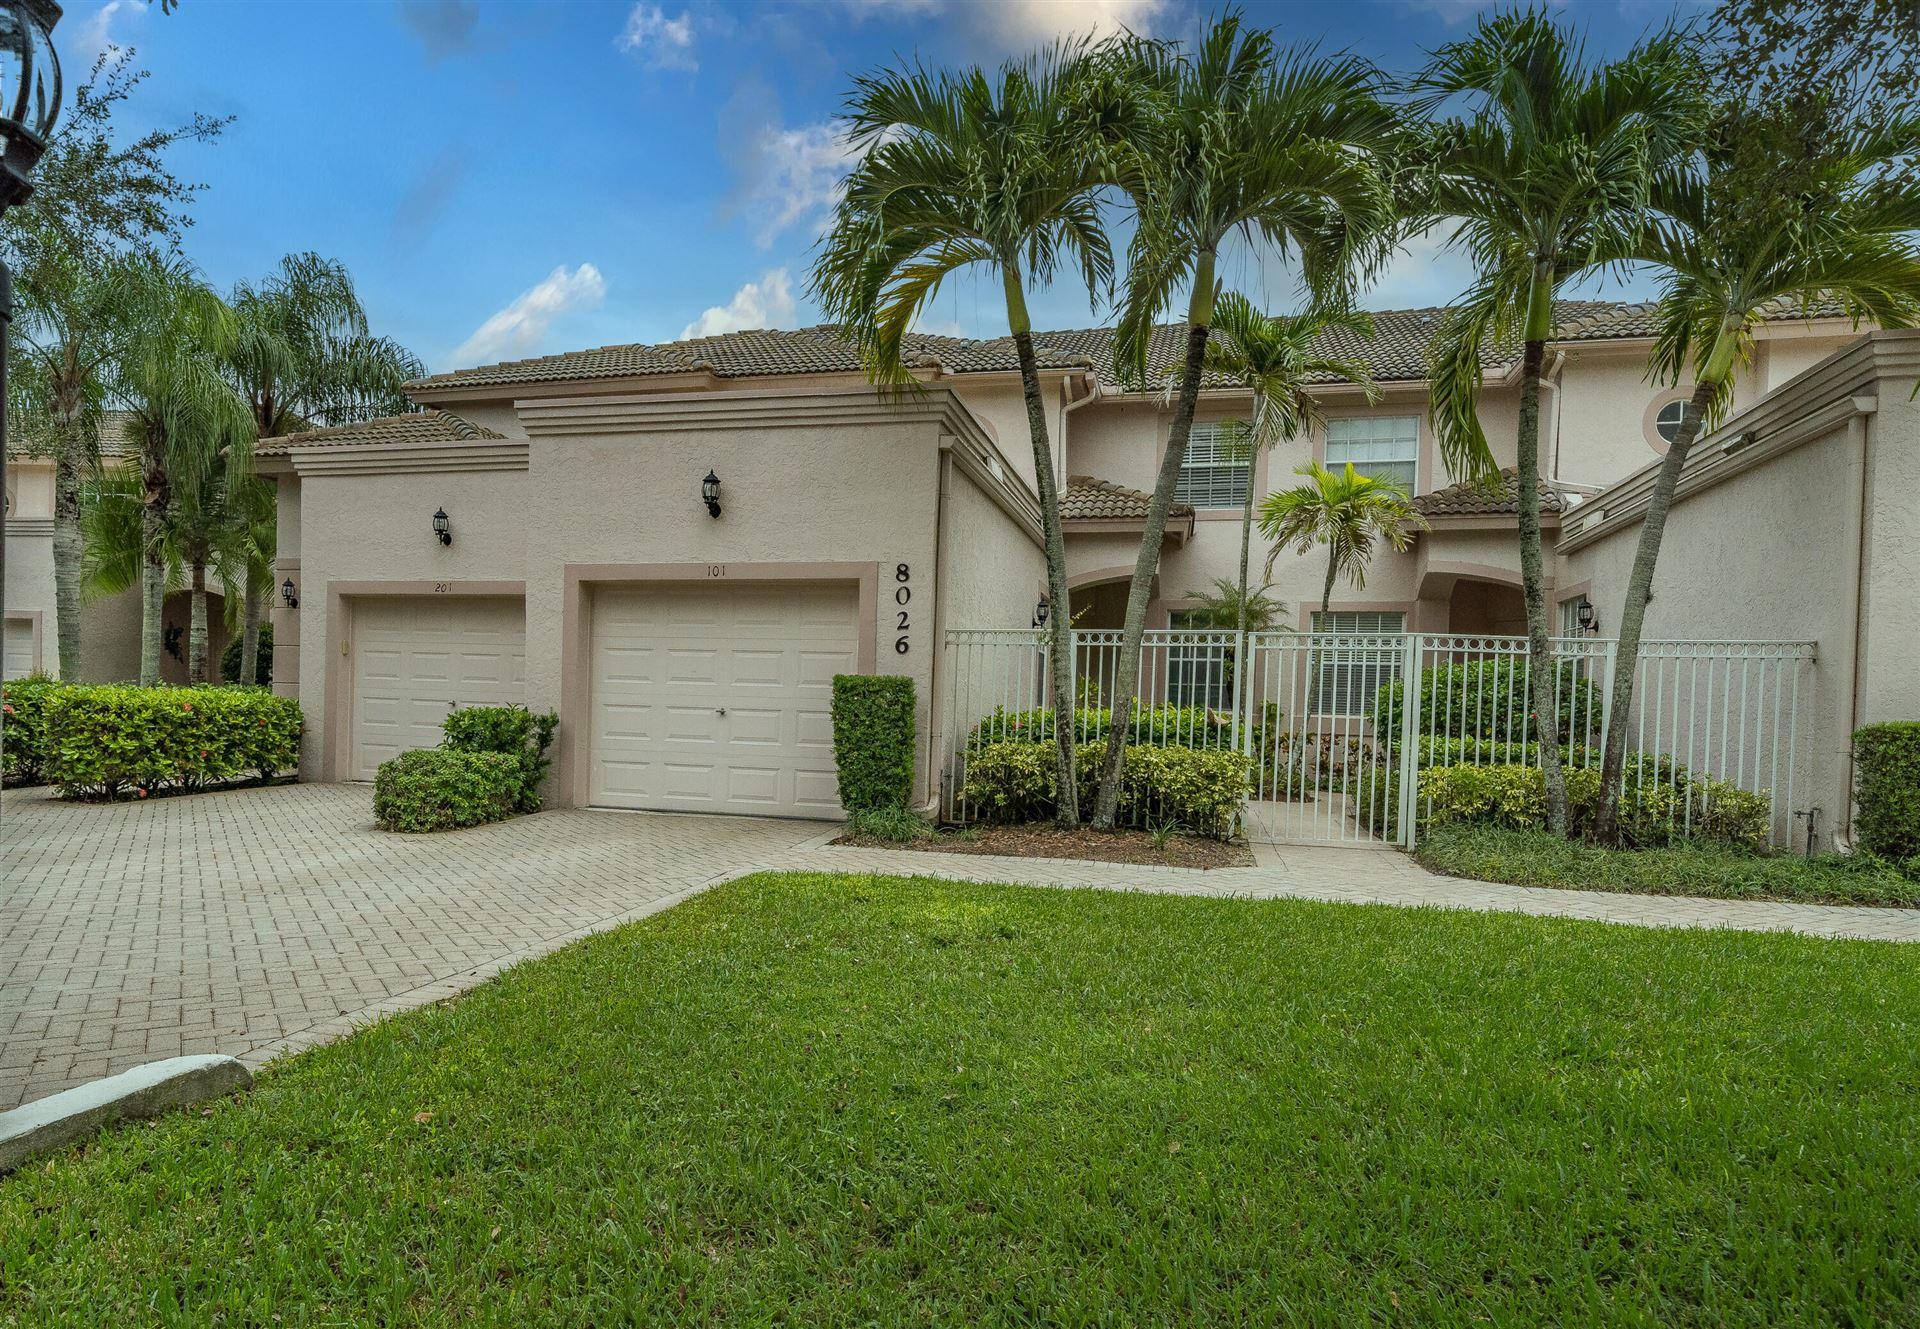 8026 Aberdeen Drive #101, Boynton Beach, FL 33472 - MLS#: RX-10752900